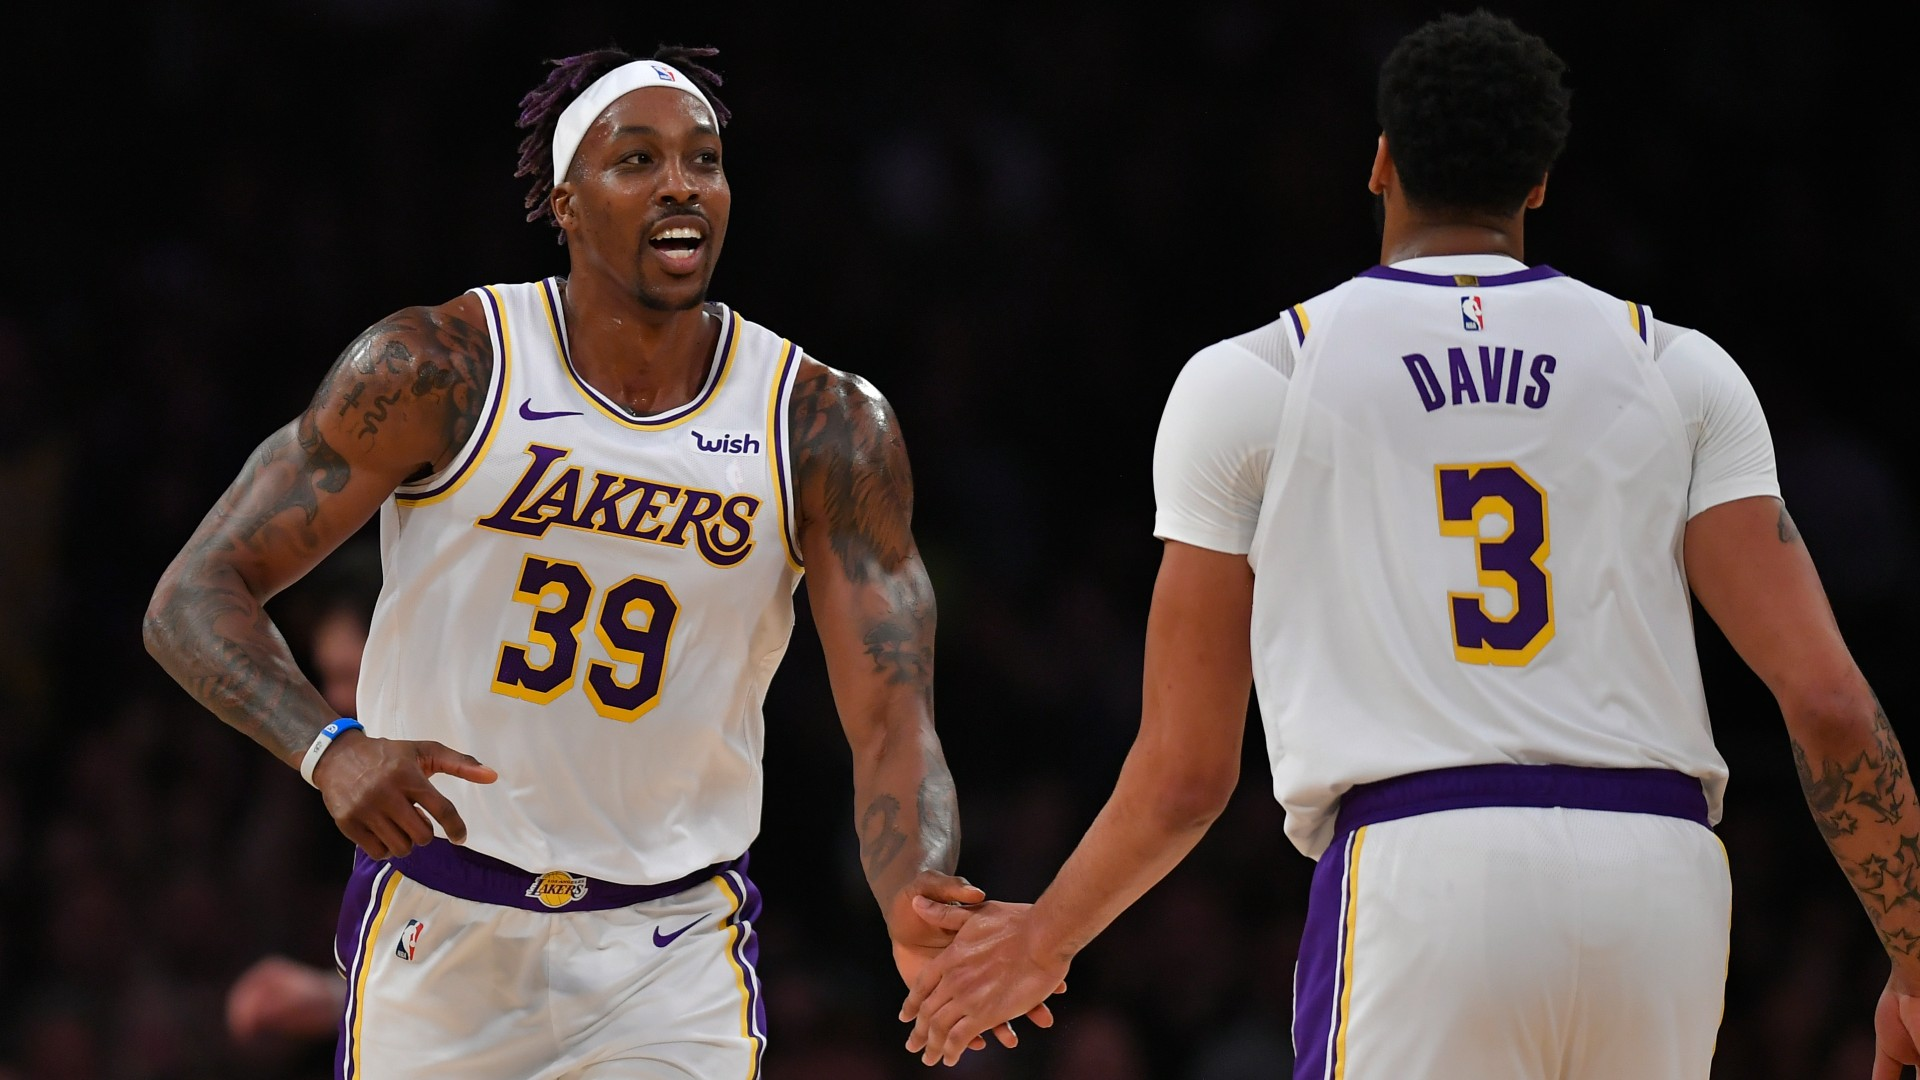 Magic Johnson reacts to heated altercation between Lakers' Anthony Davis, Dwight Howard